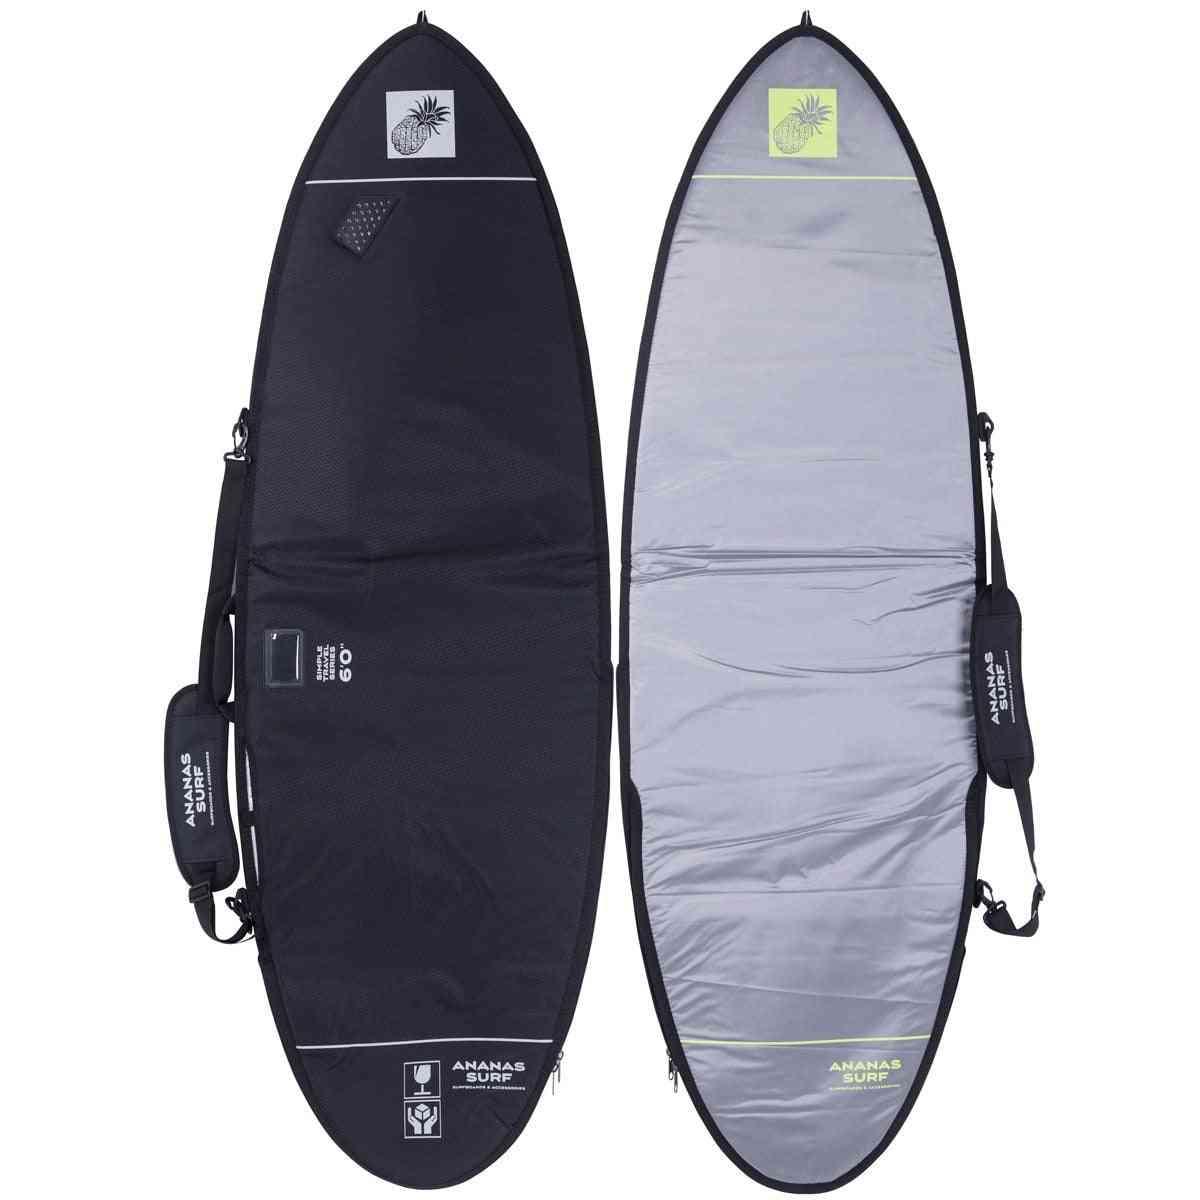 Surfboard Shortboard Hybrid Groveler Fishboard Protect Cover Travel Boardbag